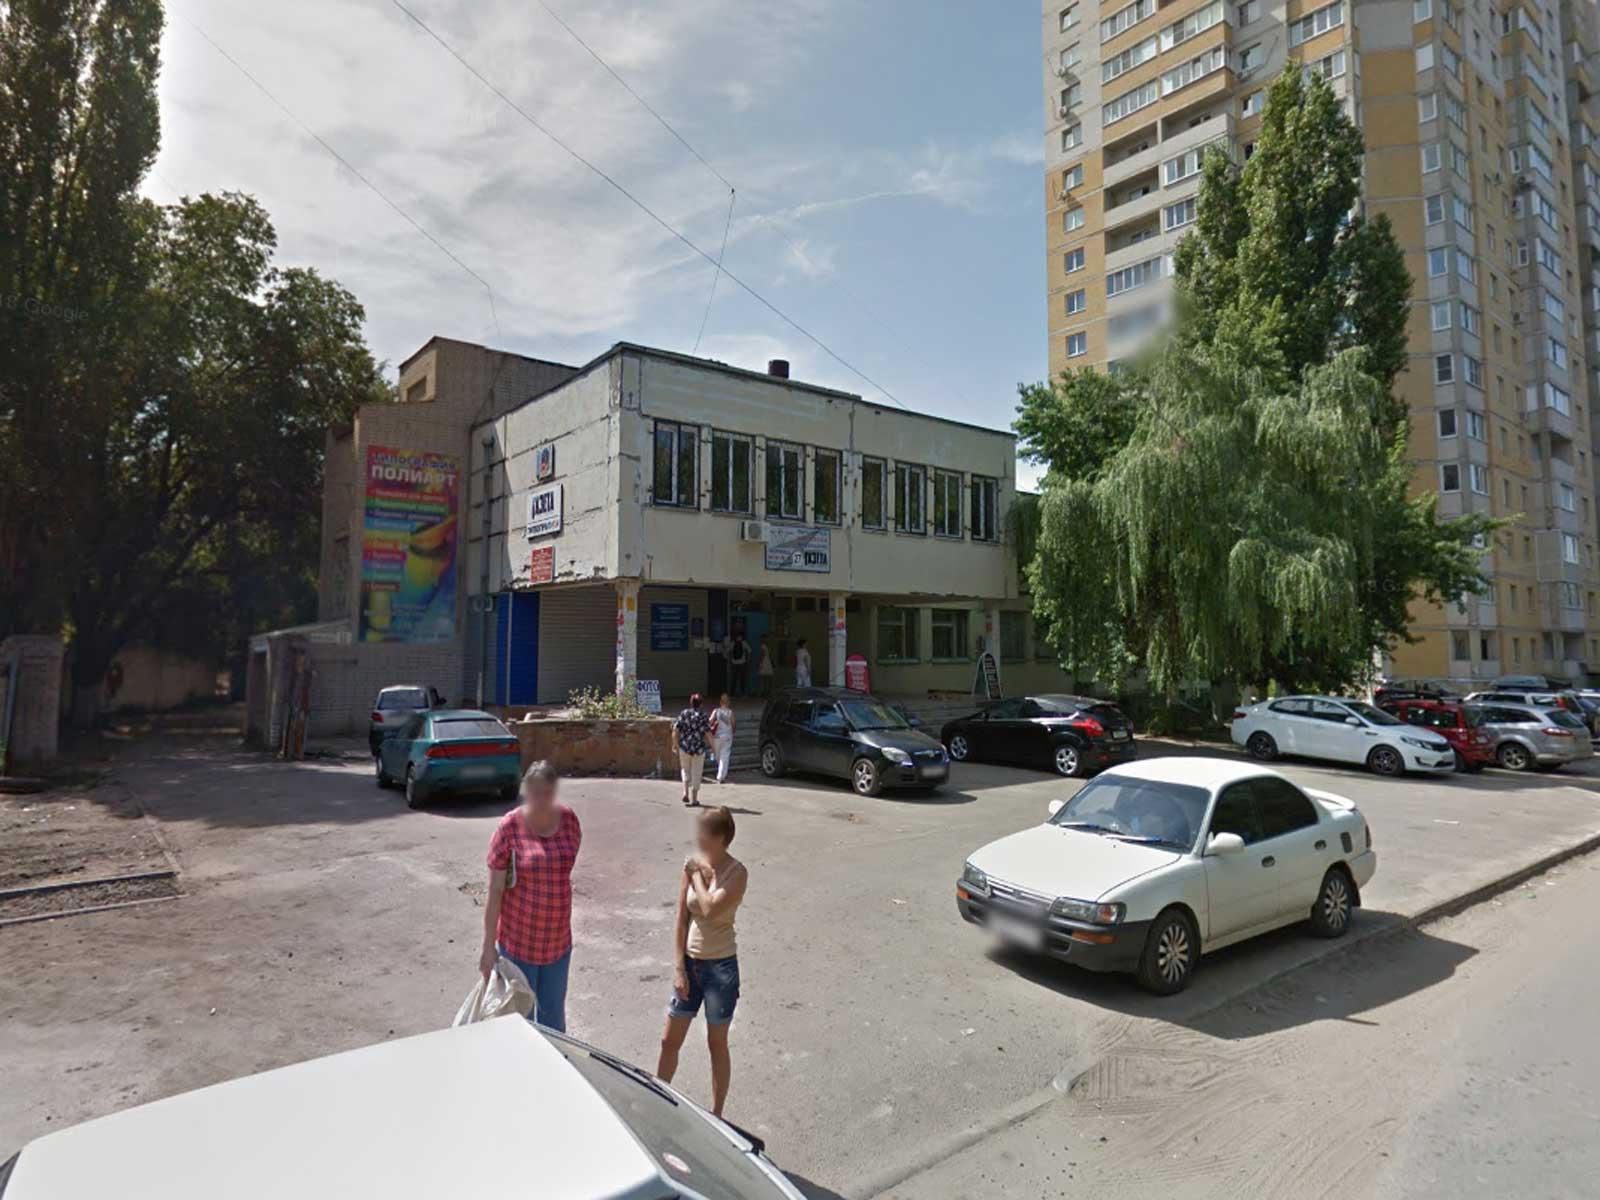 Вид на здание УФМС по Коминтерновскому району, Воронеж